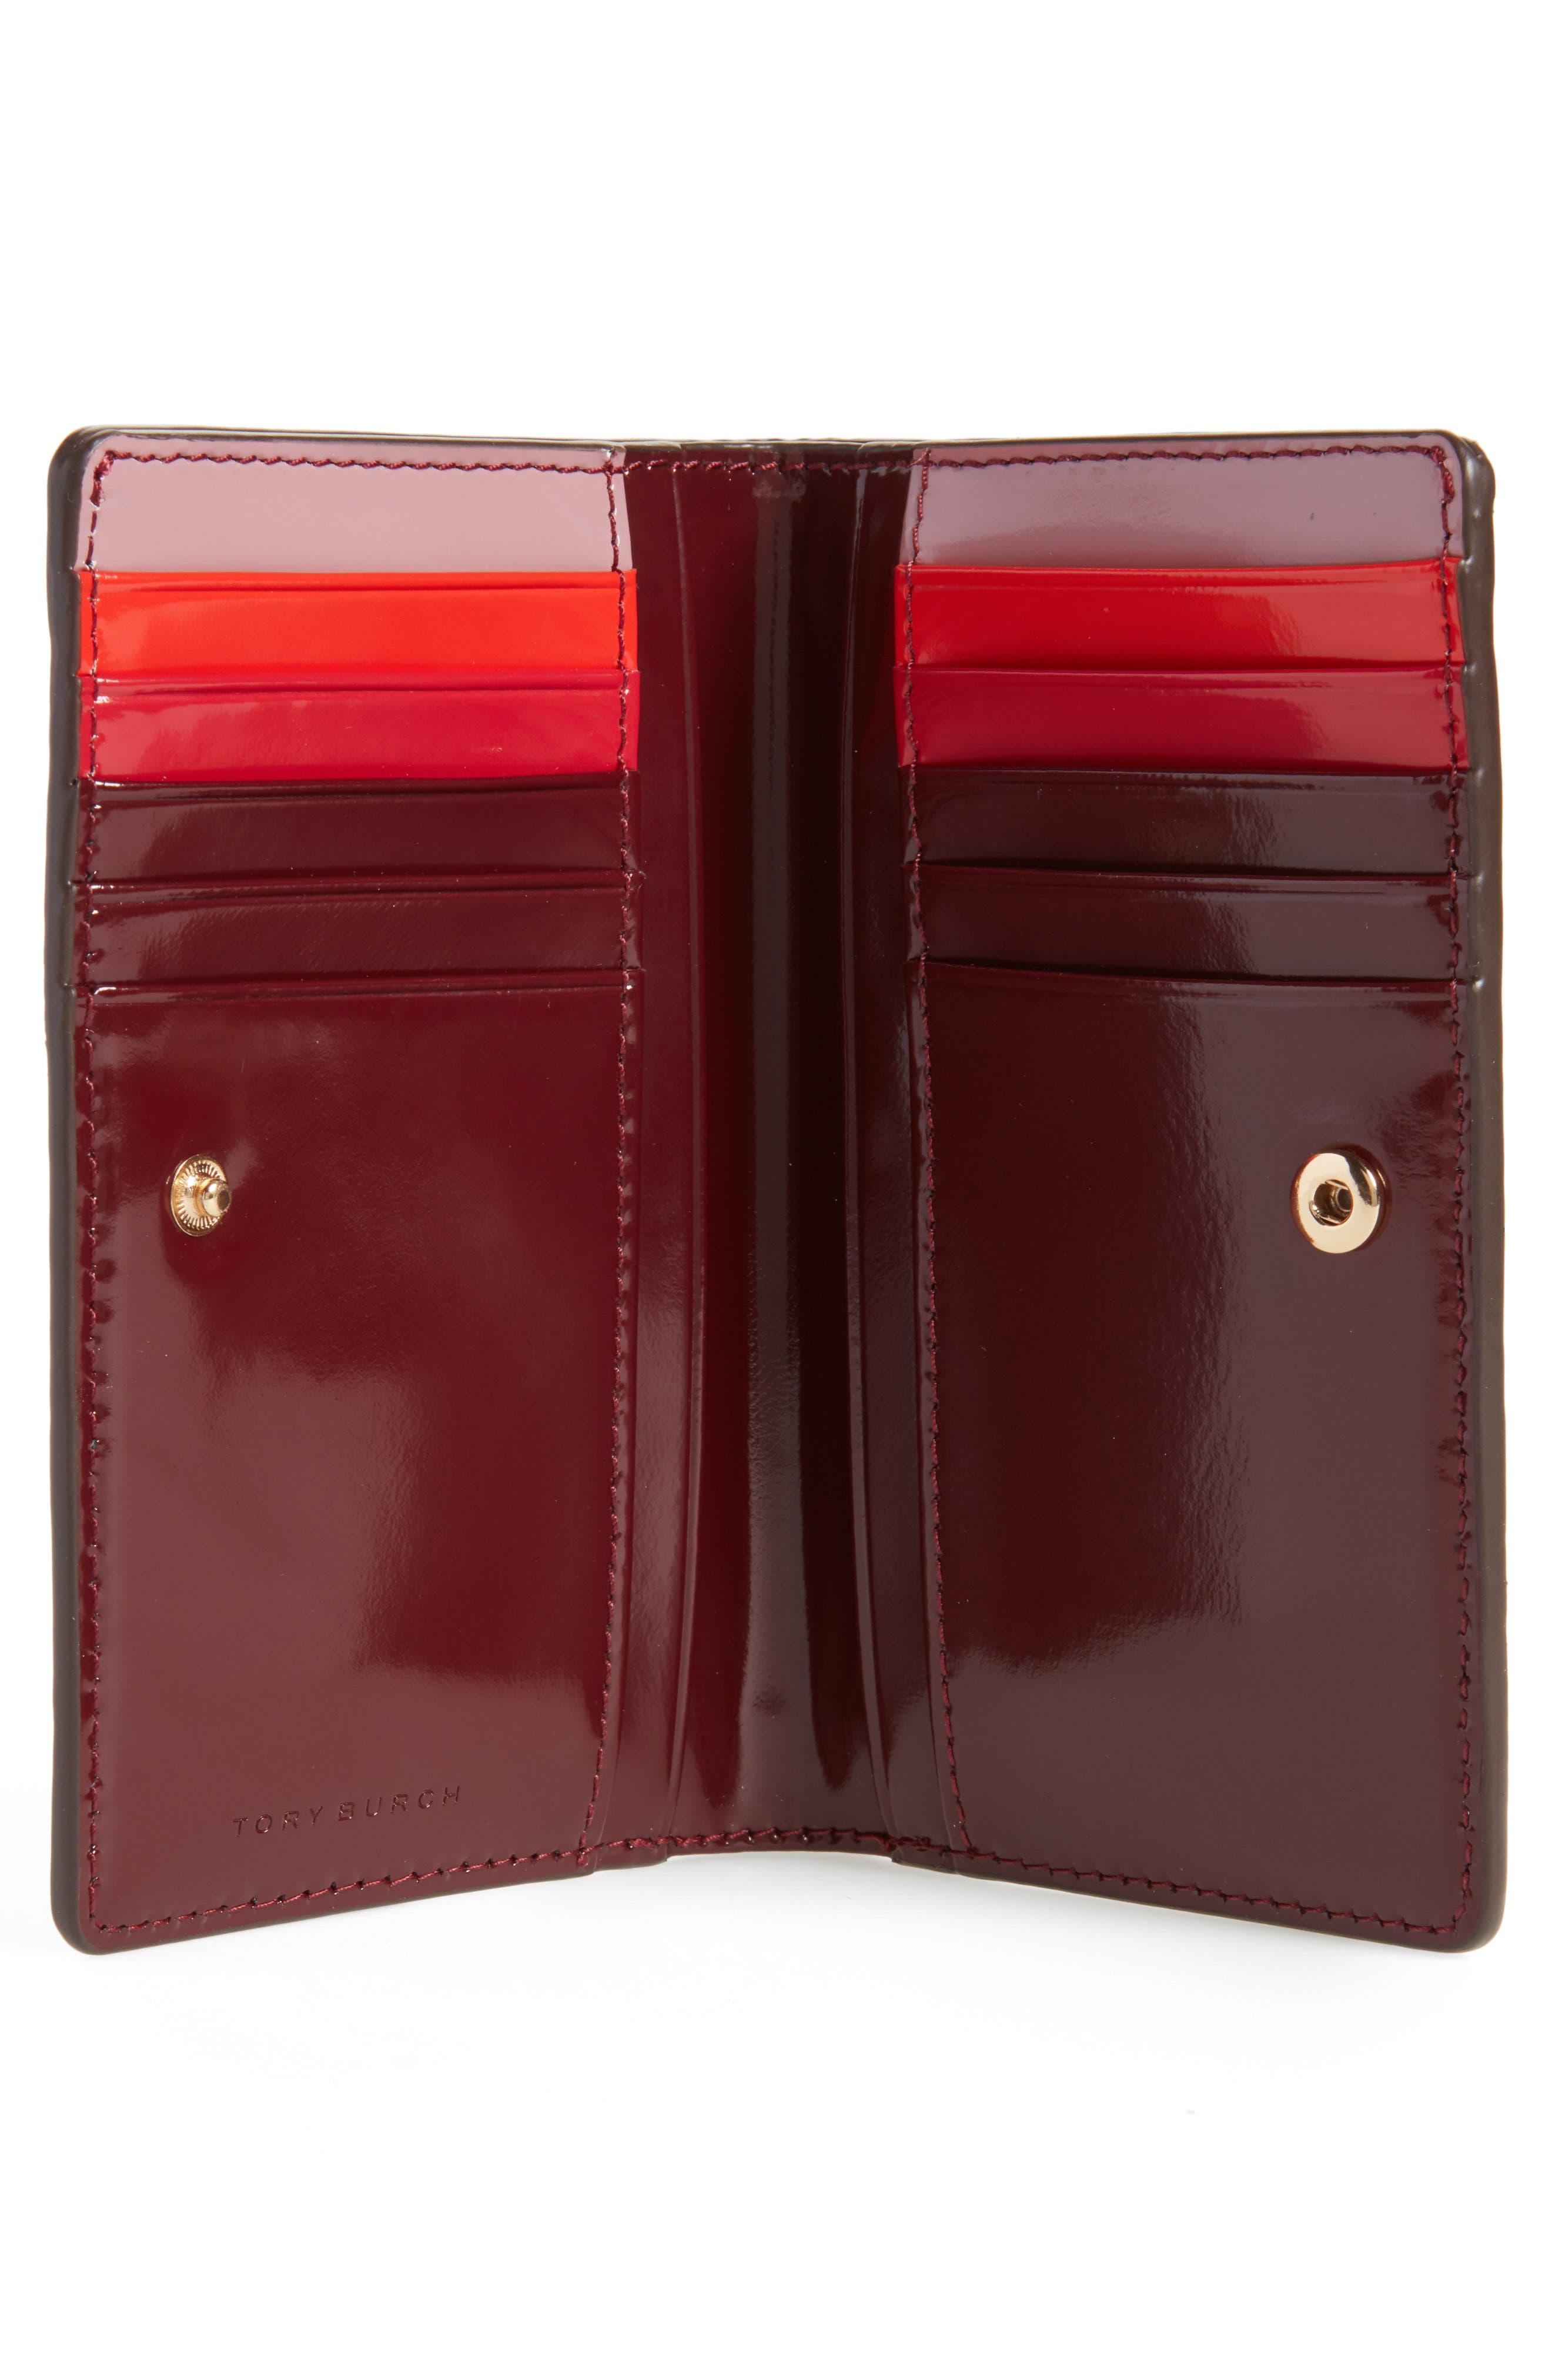 Medium McGraw Dachshund Slim Leather Wallet,                             Alternate thumbnail 2, color,                             600